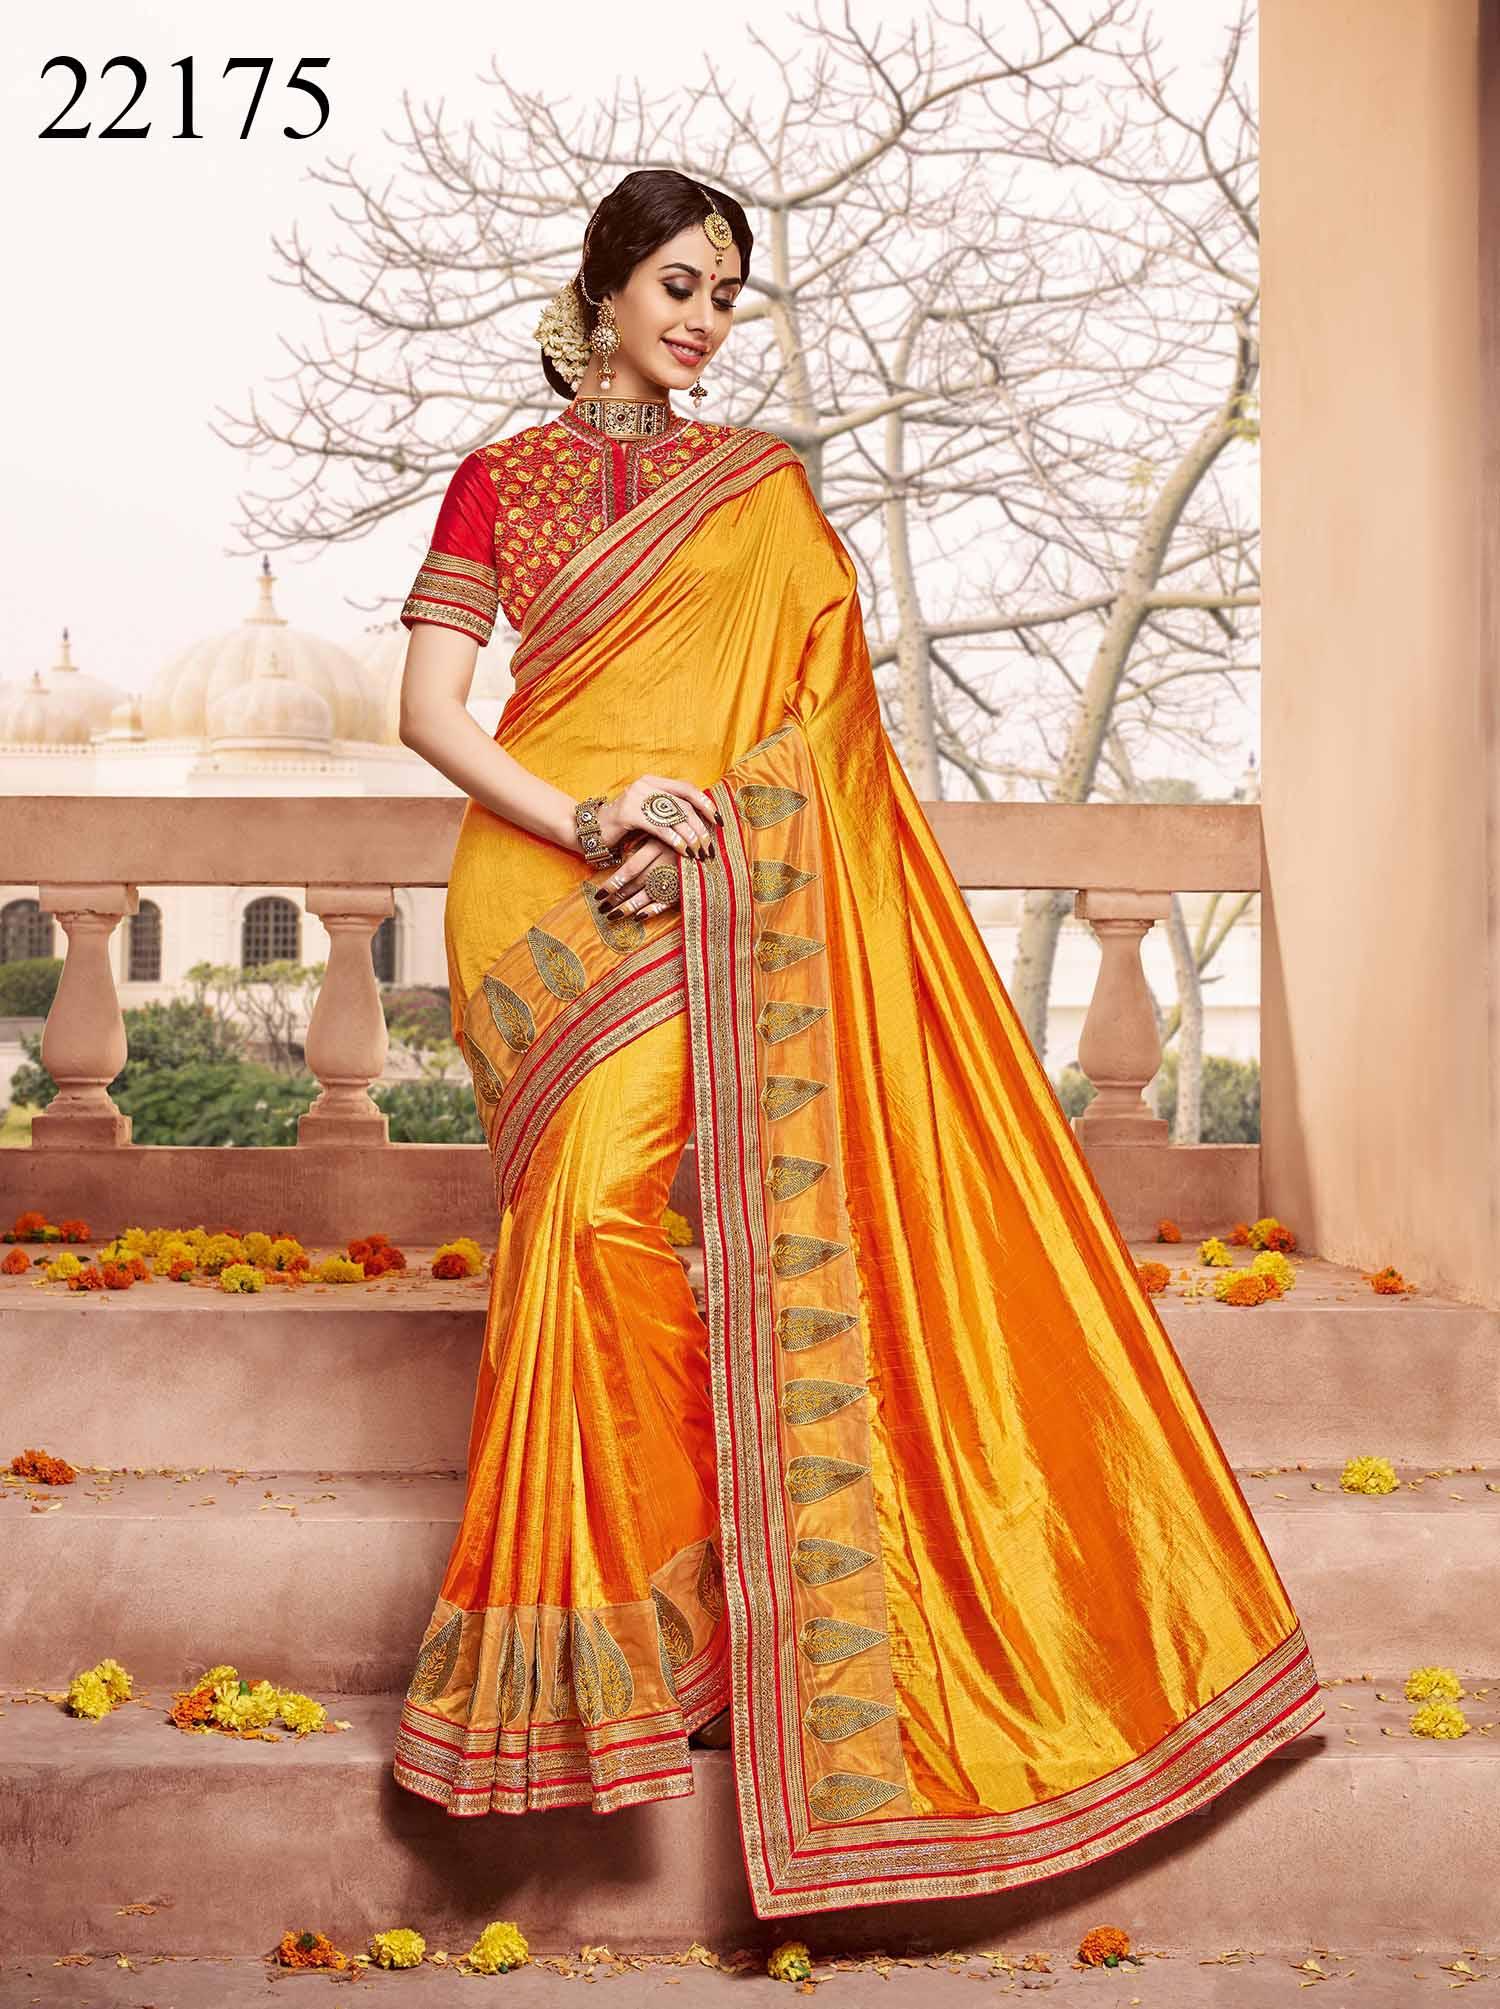 Newly Wedded Bridal Saree Dania 22175 | Bride Special